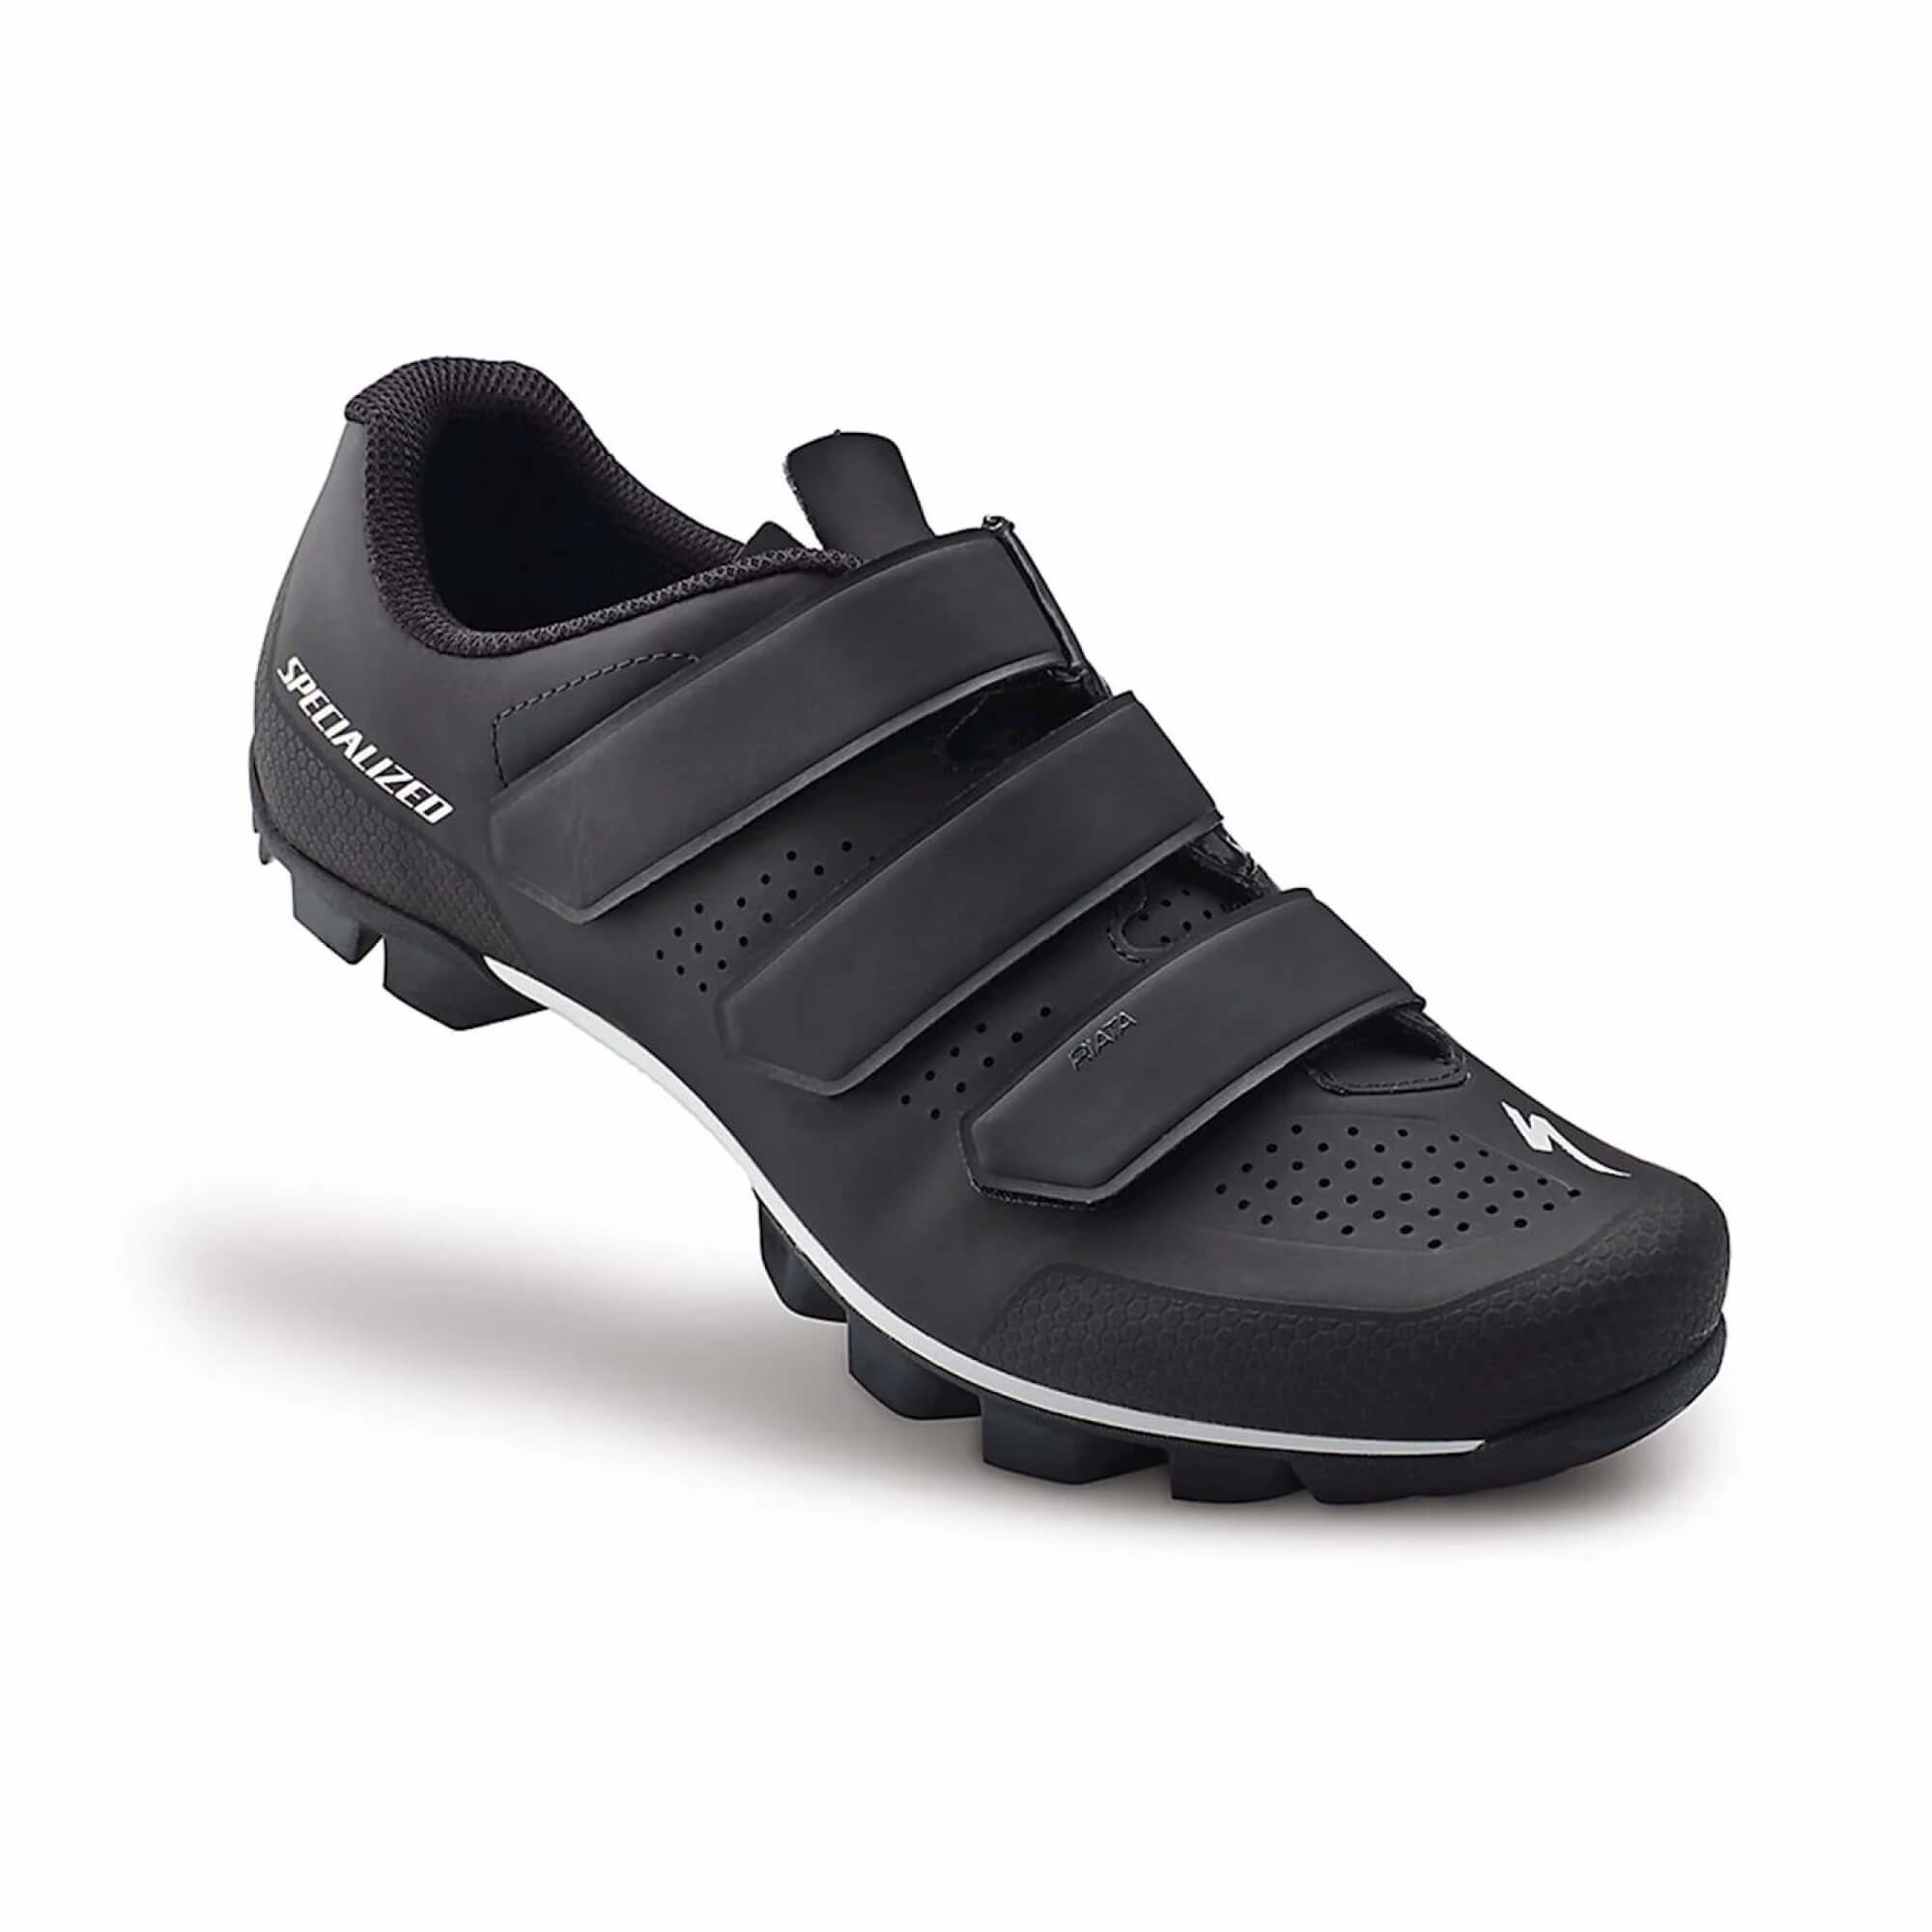 Riata MTB Shoe Wmn Blk 38 Size: 38-1